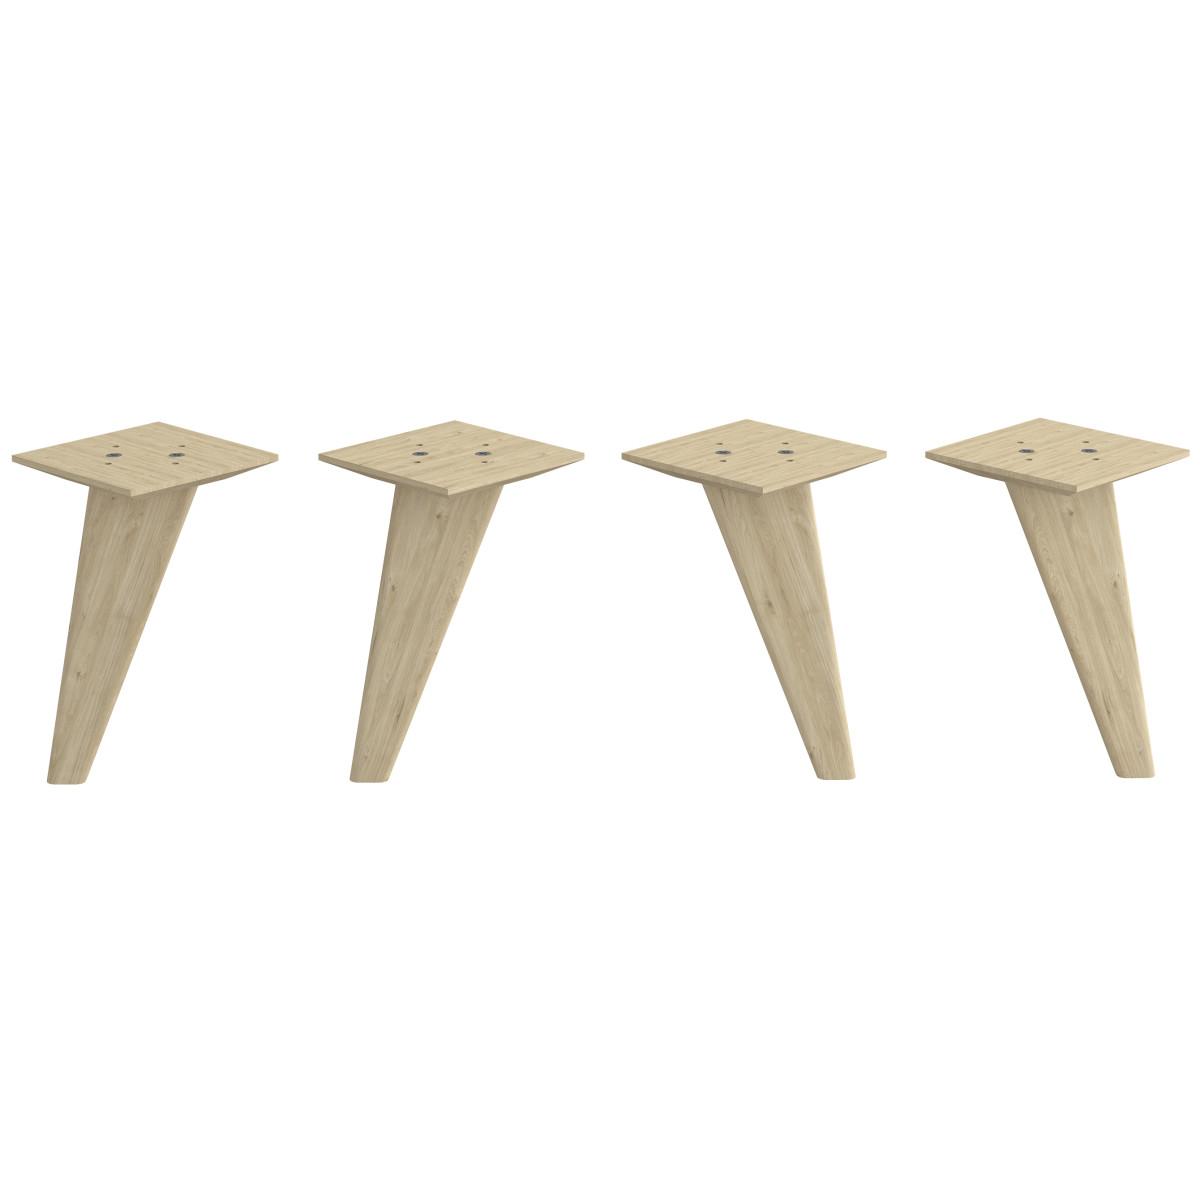 Набор ножек мебельных Spaceo KUB 4 шт